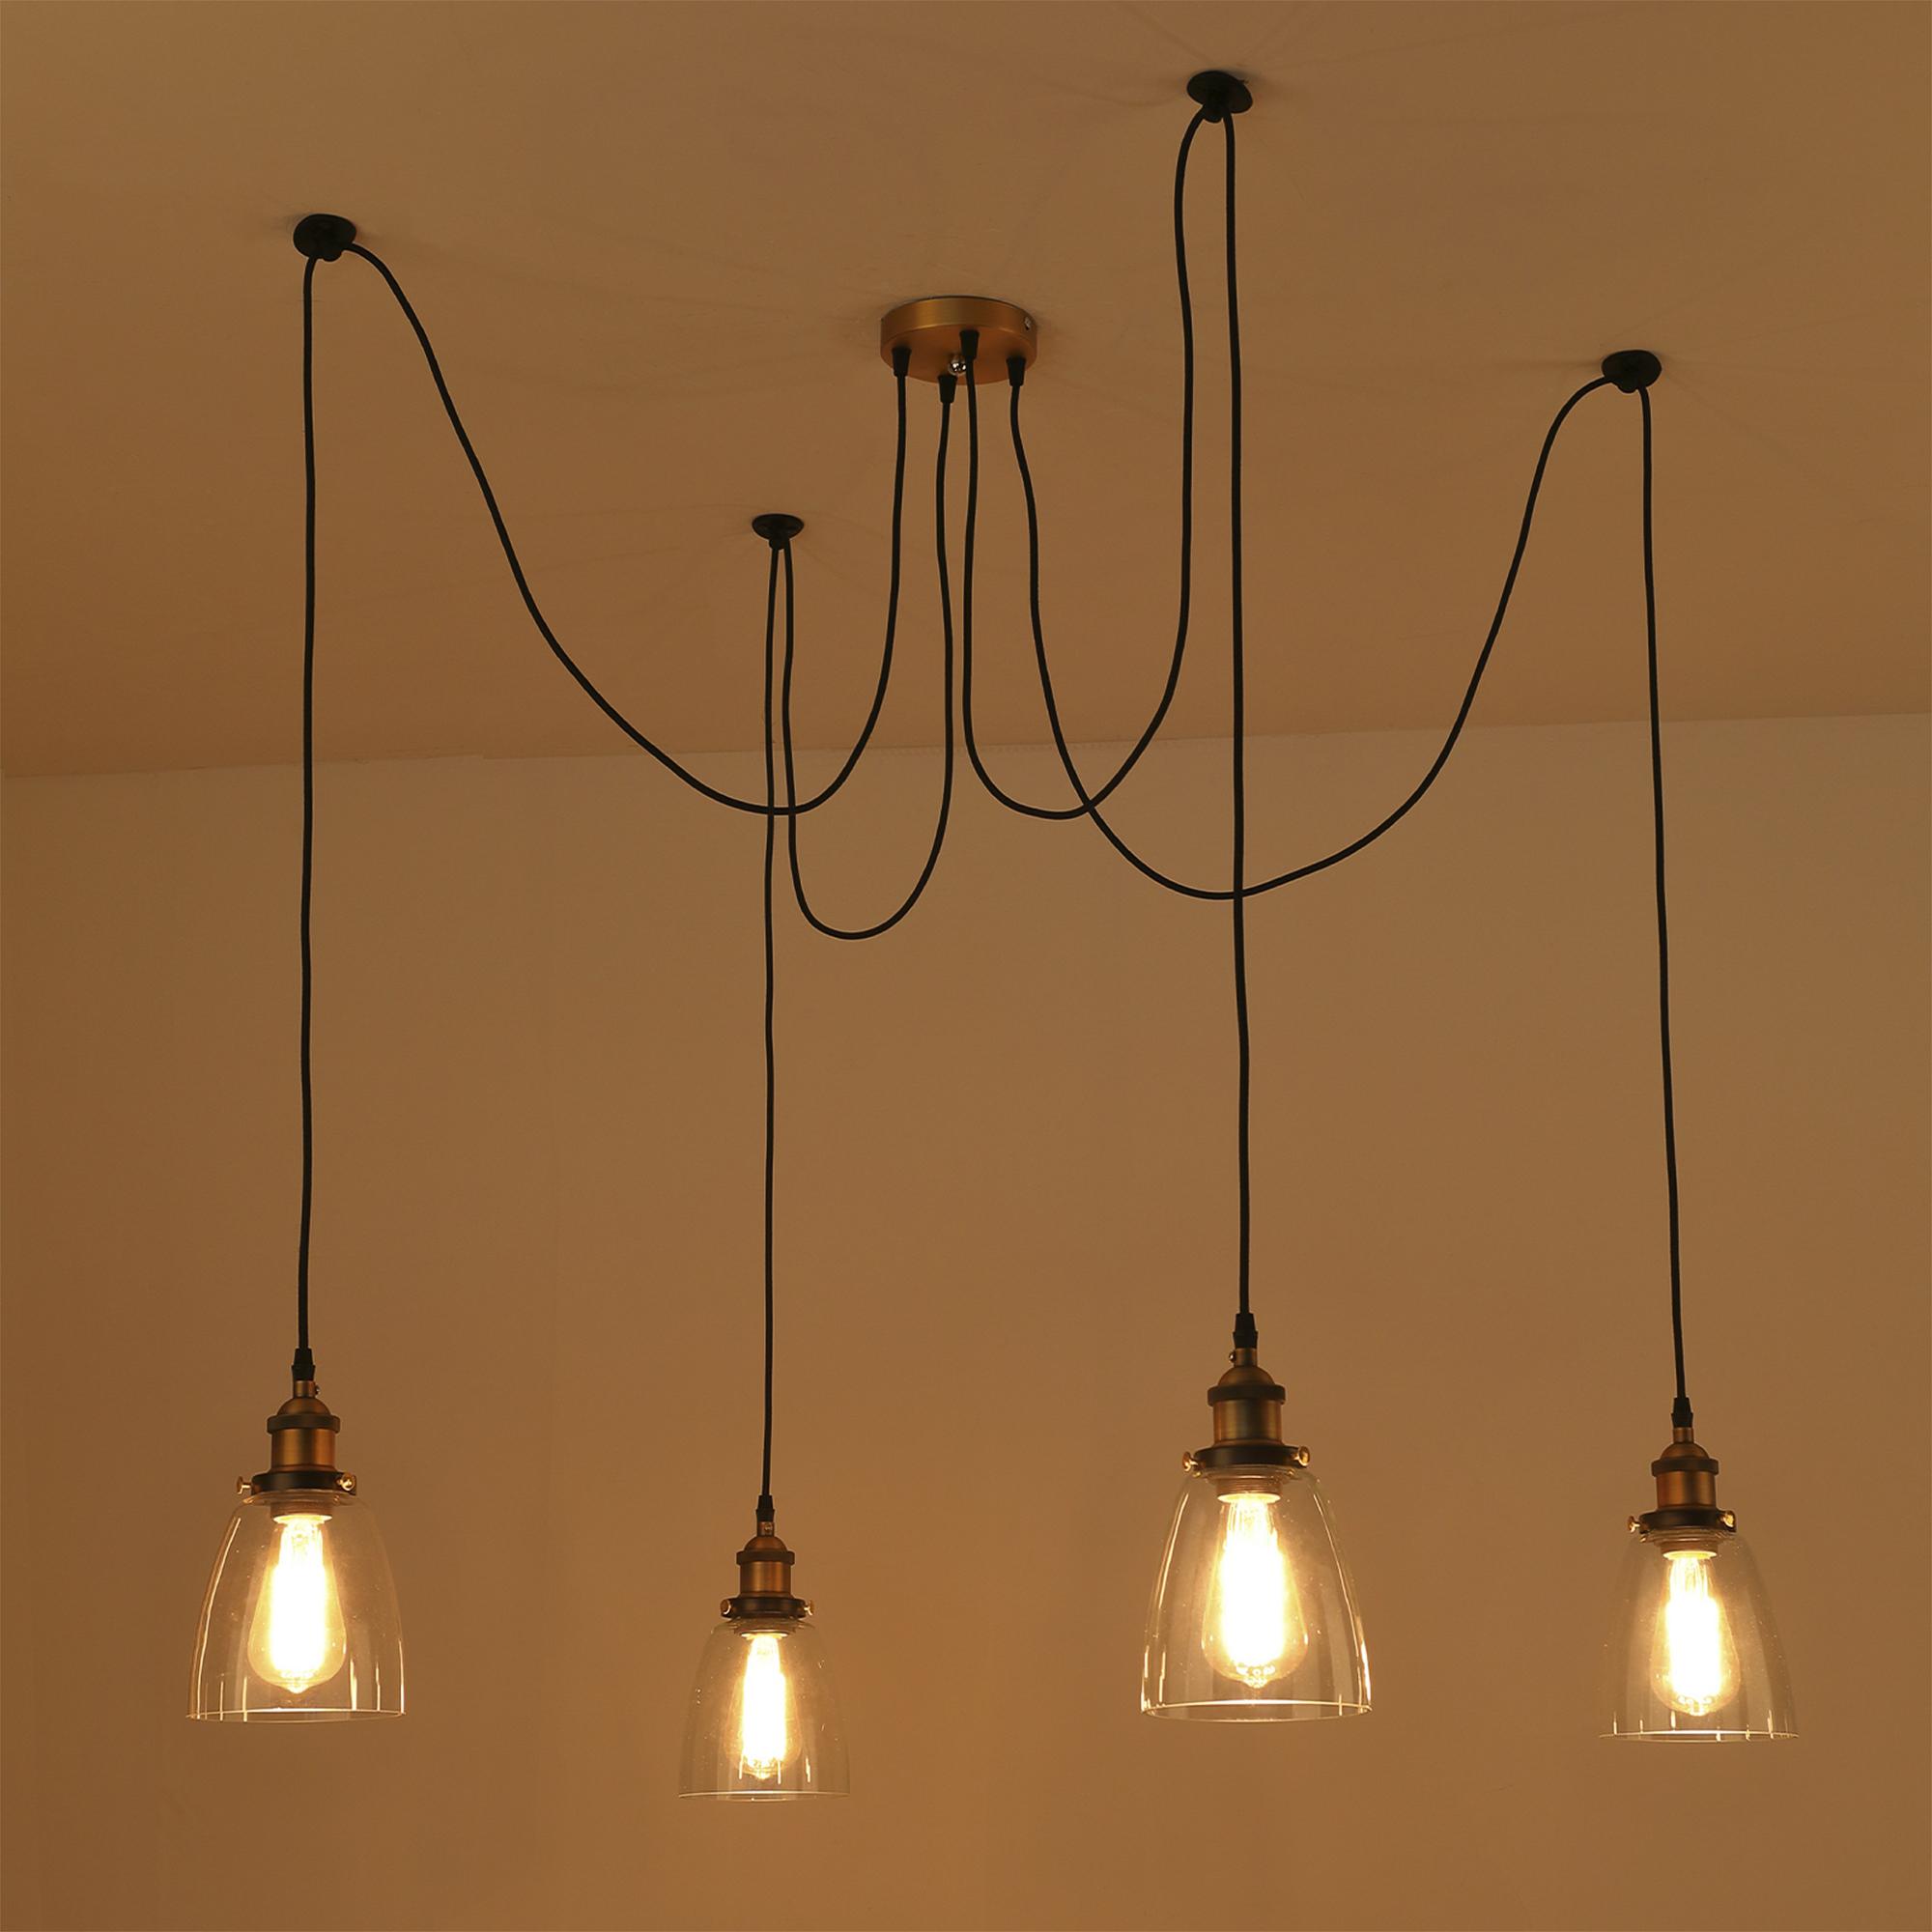 Vintage Spider Industrial Lighting Retro Loft Hanging Suspension Fixtures Decors